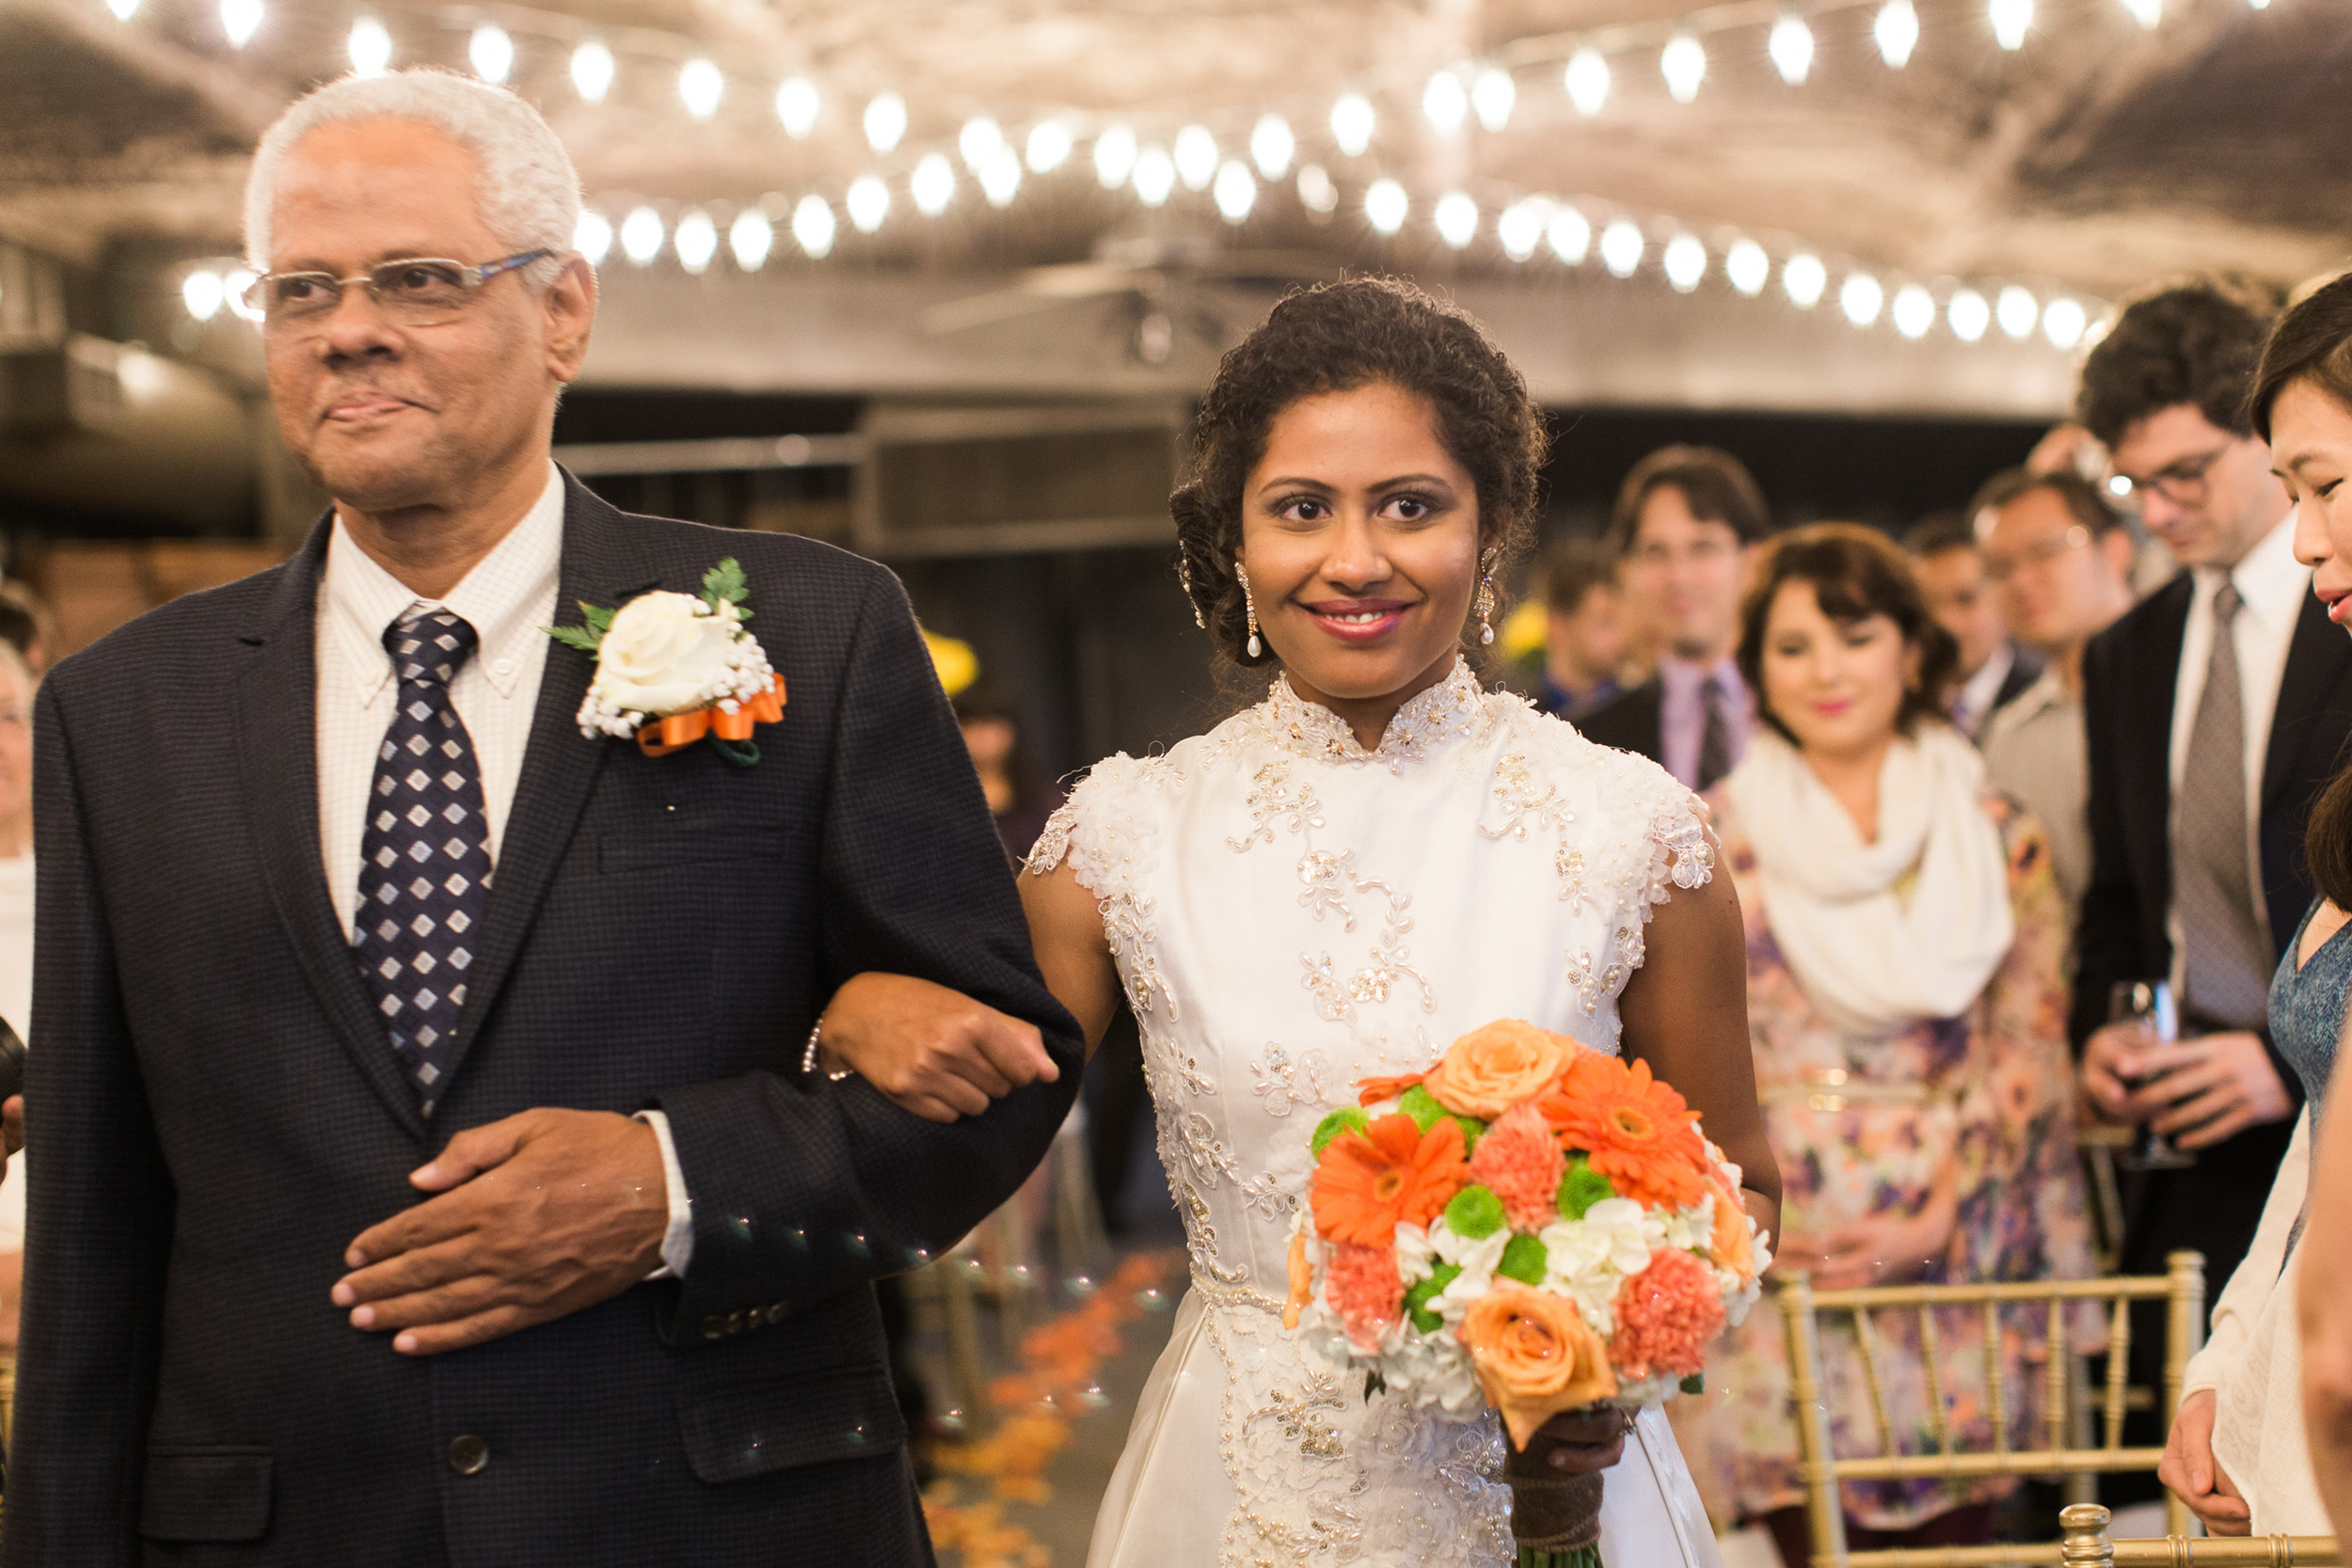 9c906-messina-hof-wedding-31messina-hof-wedding-31.jpg